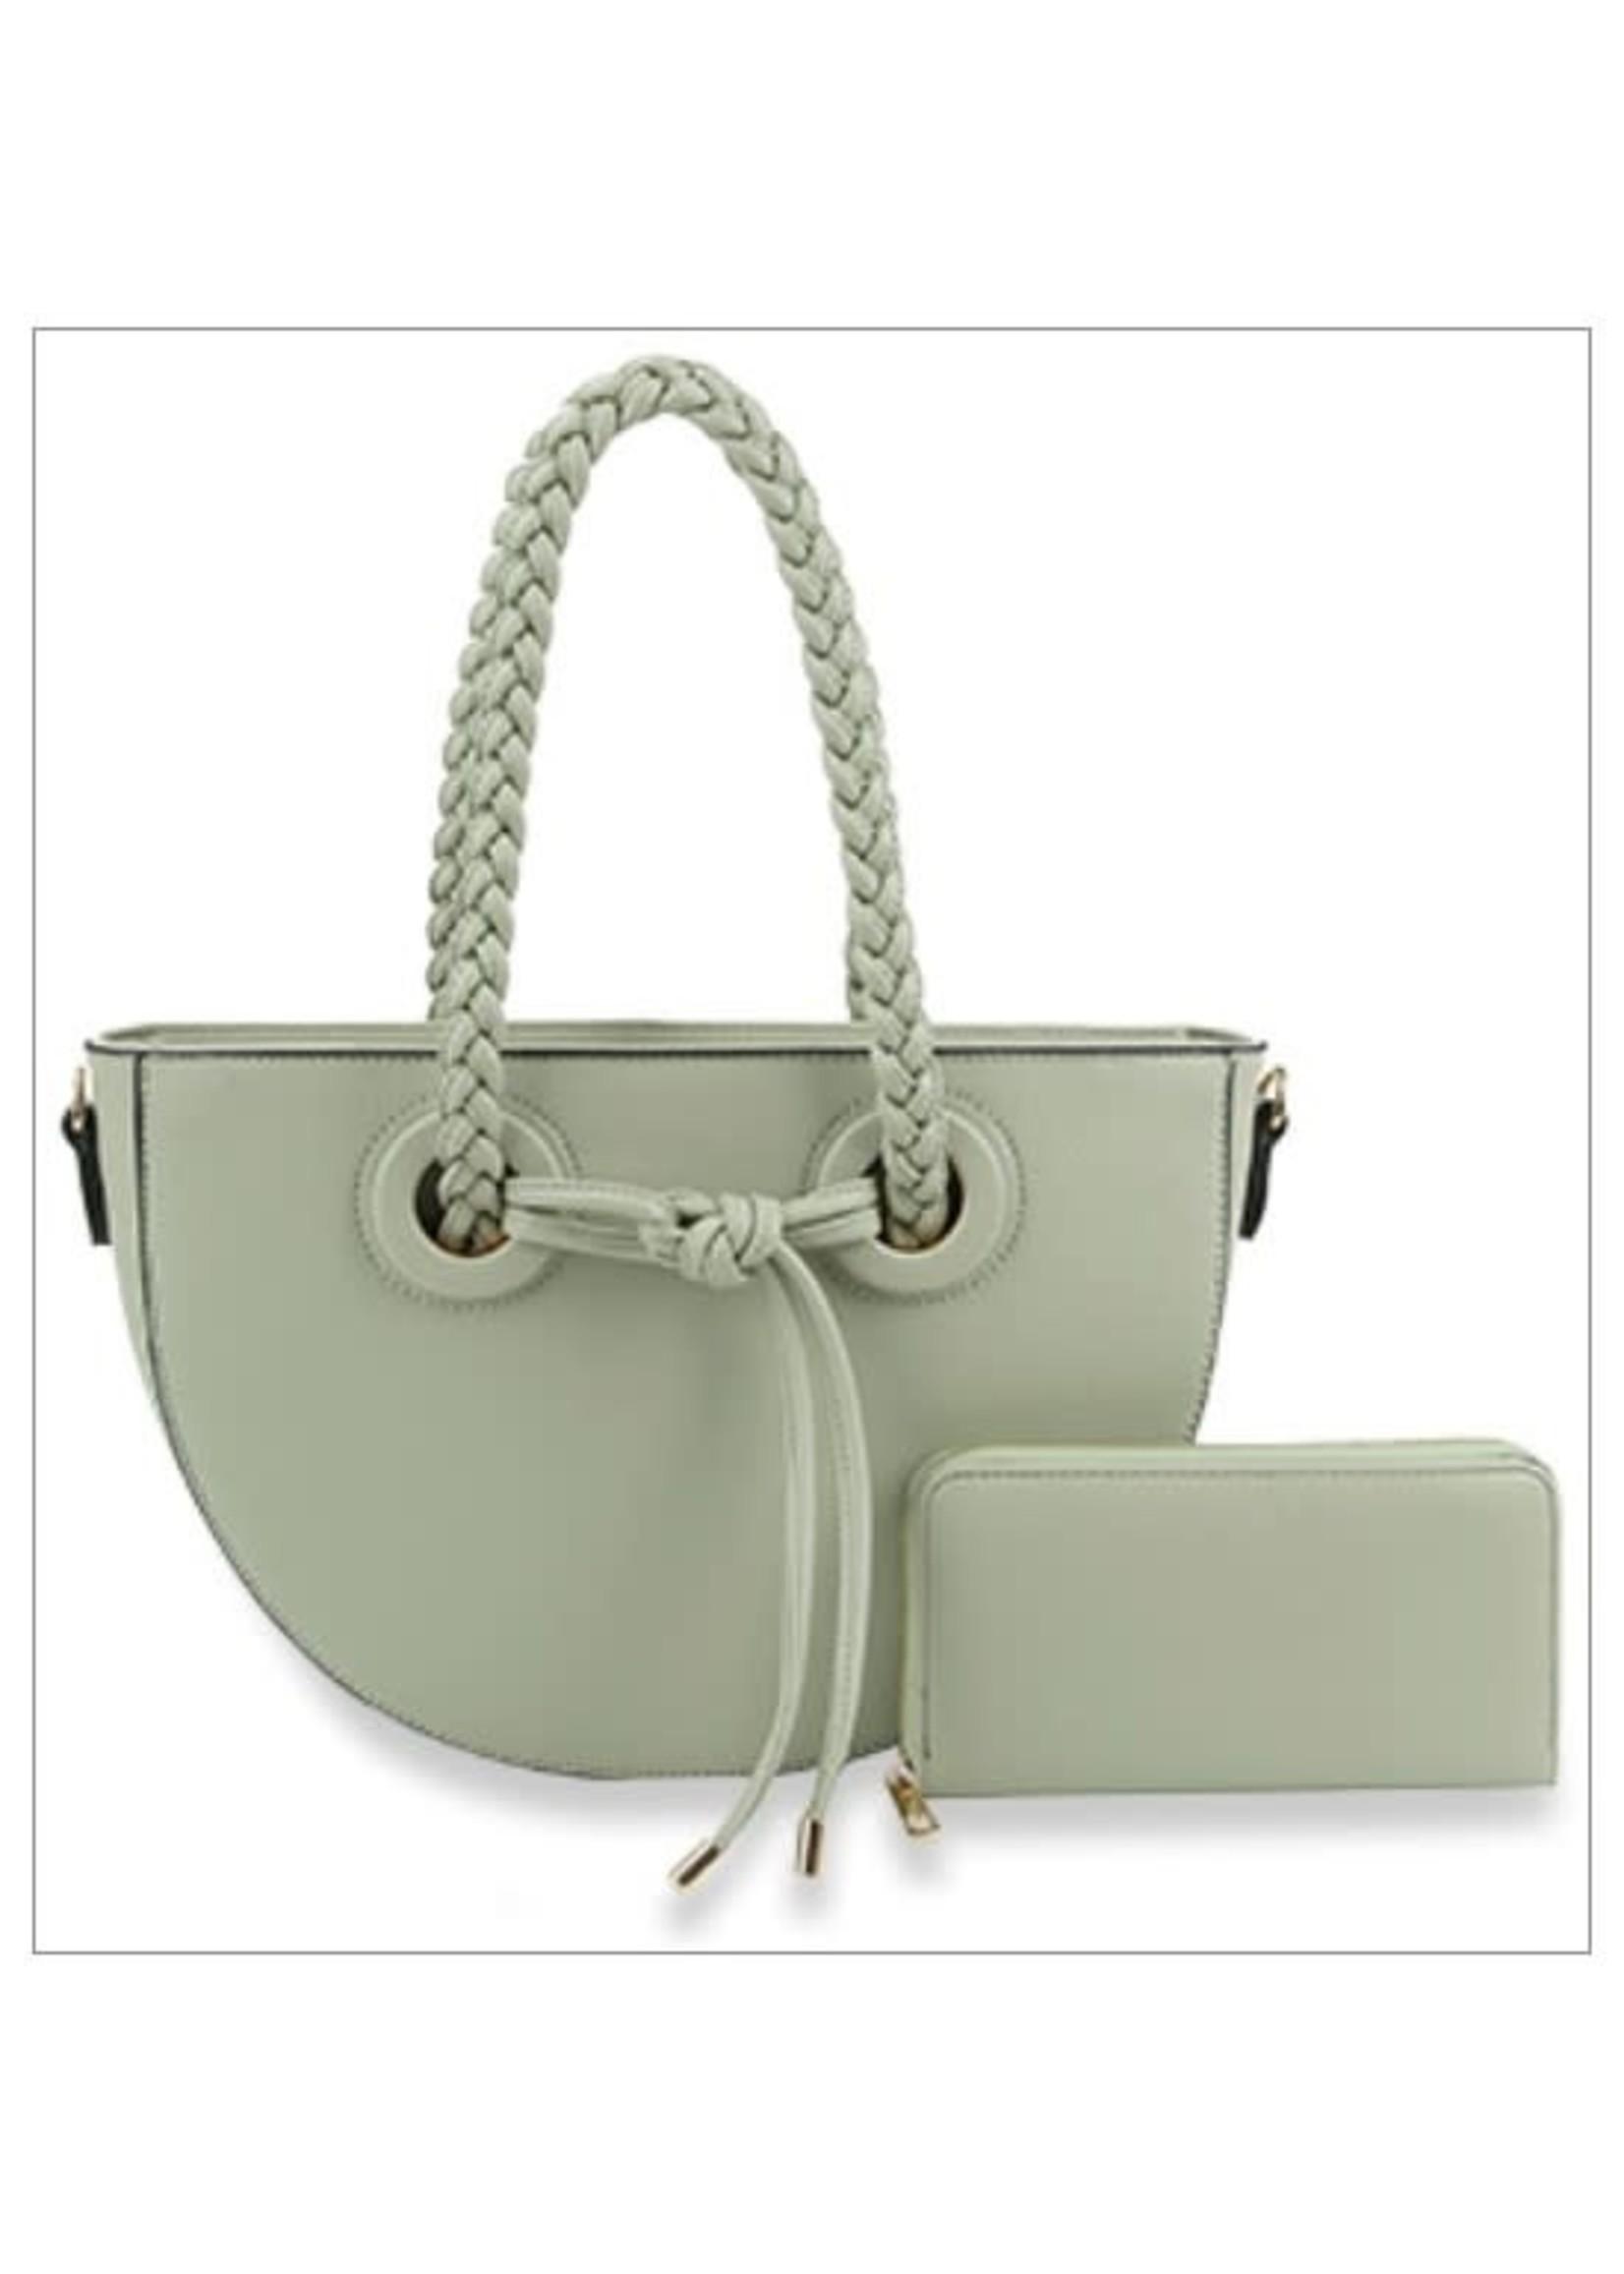 Mint Braided Handle Tote  Handbag Set